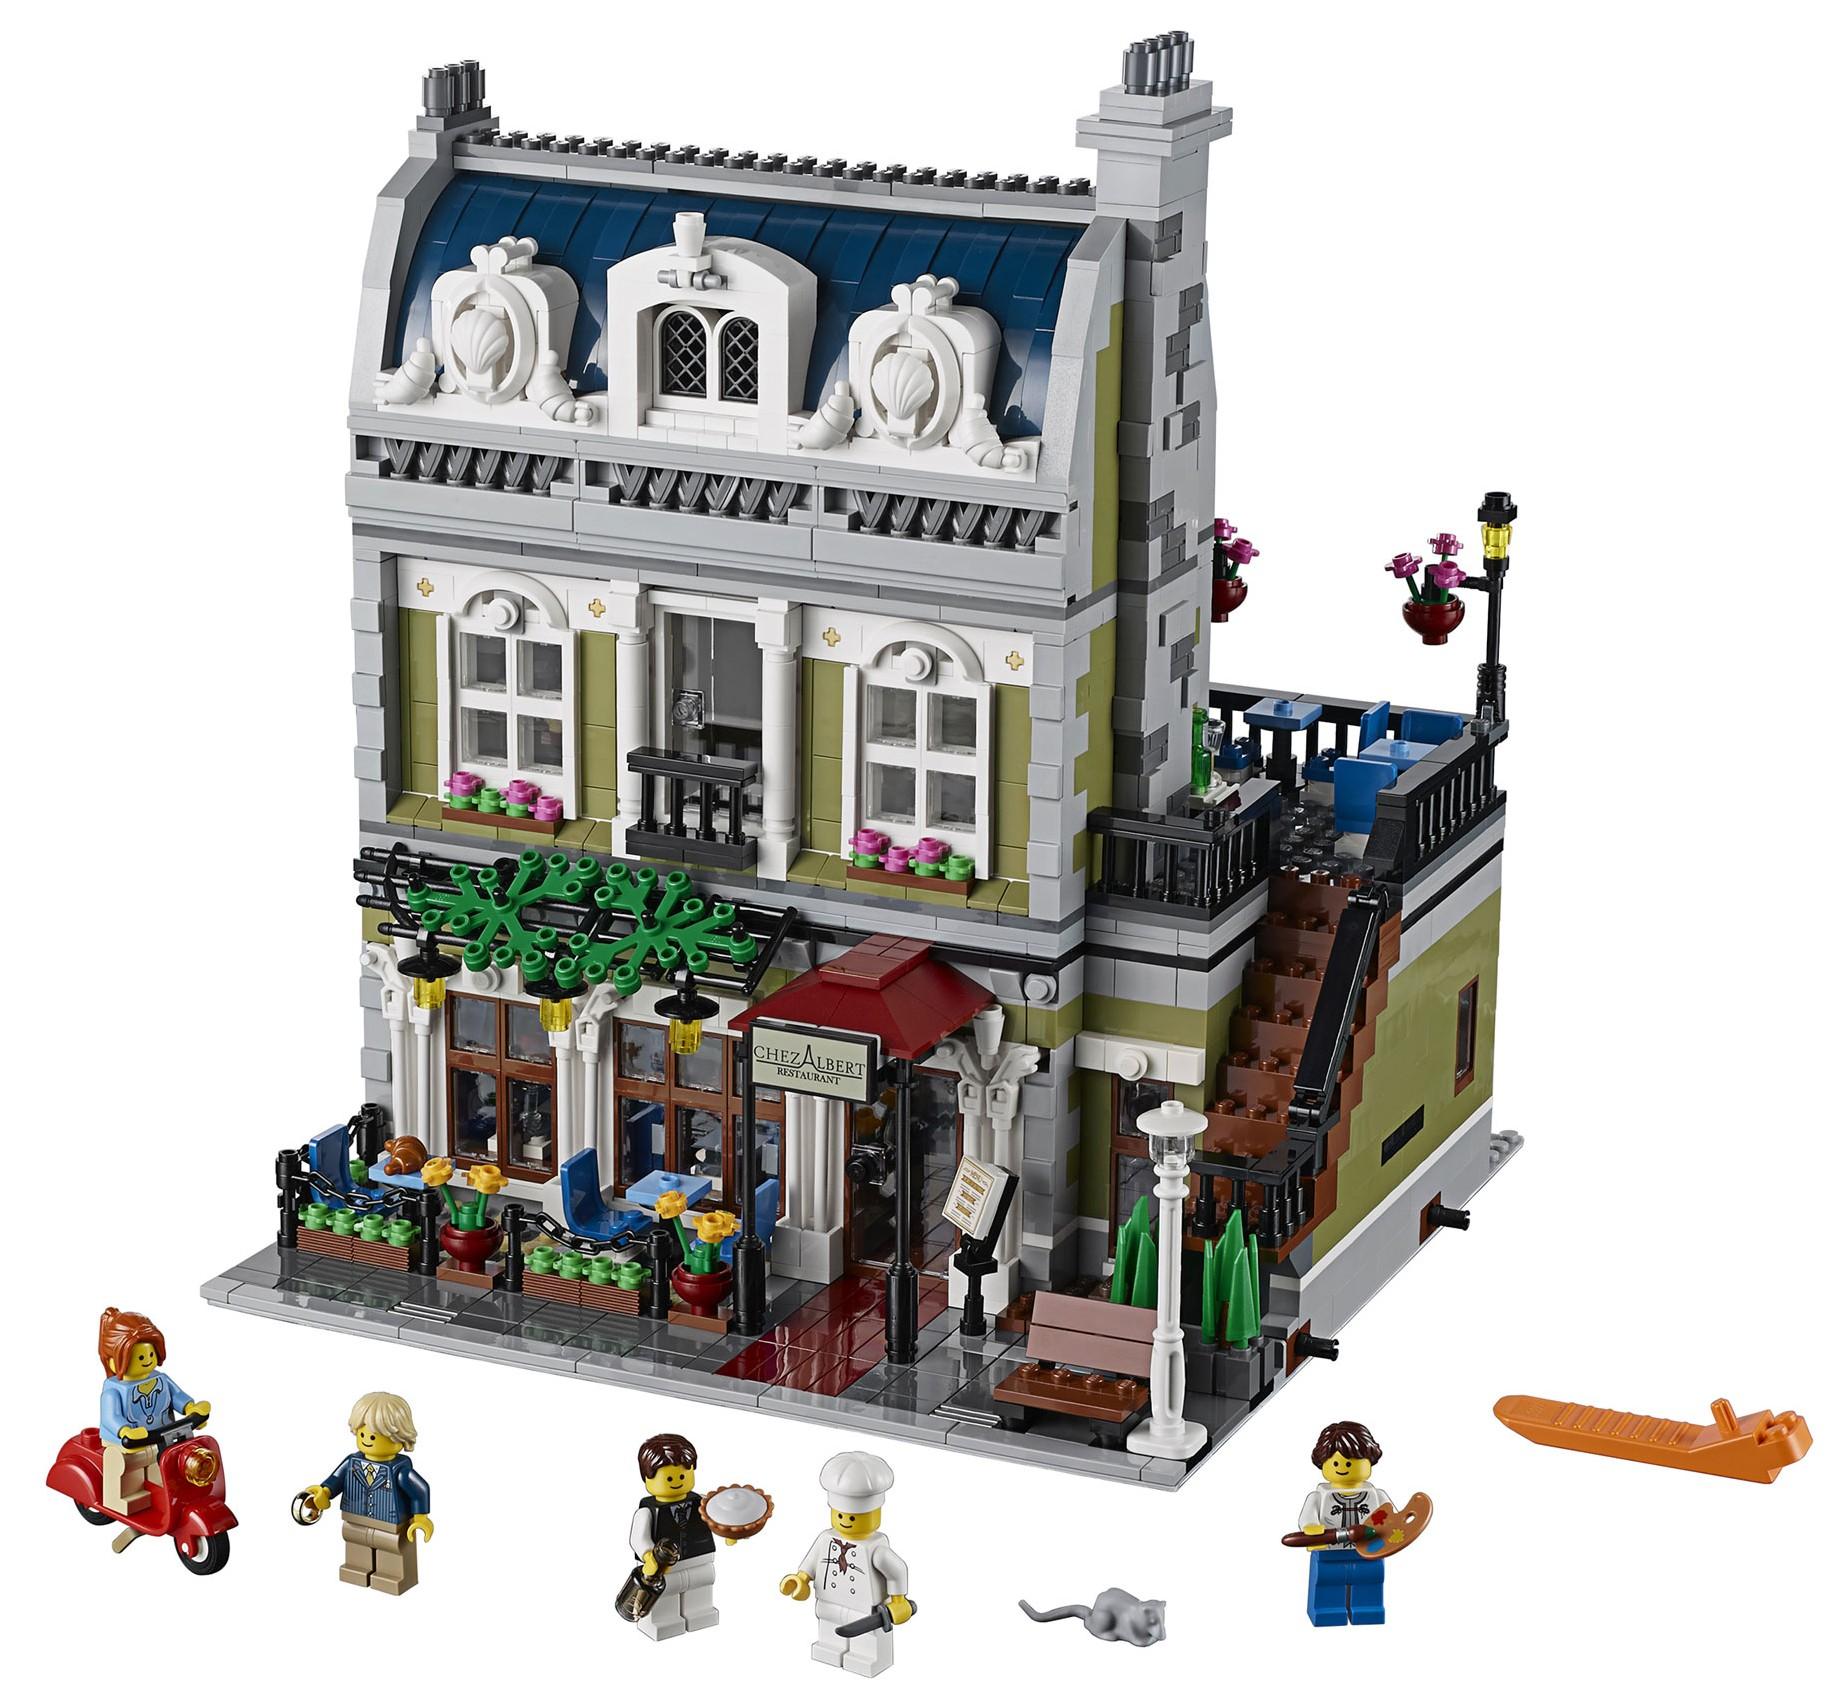 2014 lego parisian restaurant 10243 modular building photo. Black Bedroom Furniture Sets. Home Design Ideas